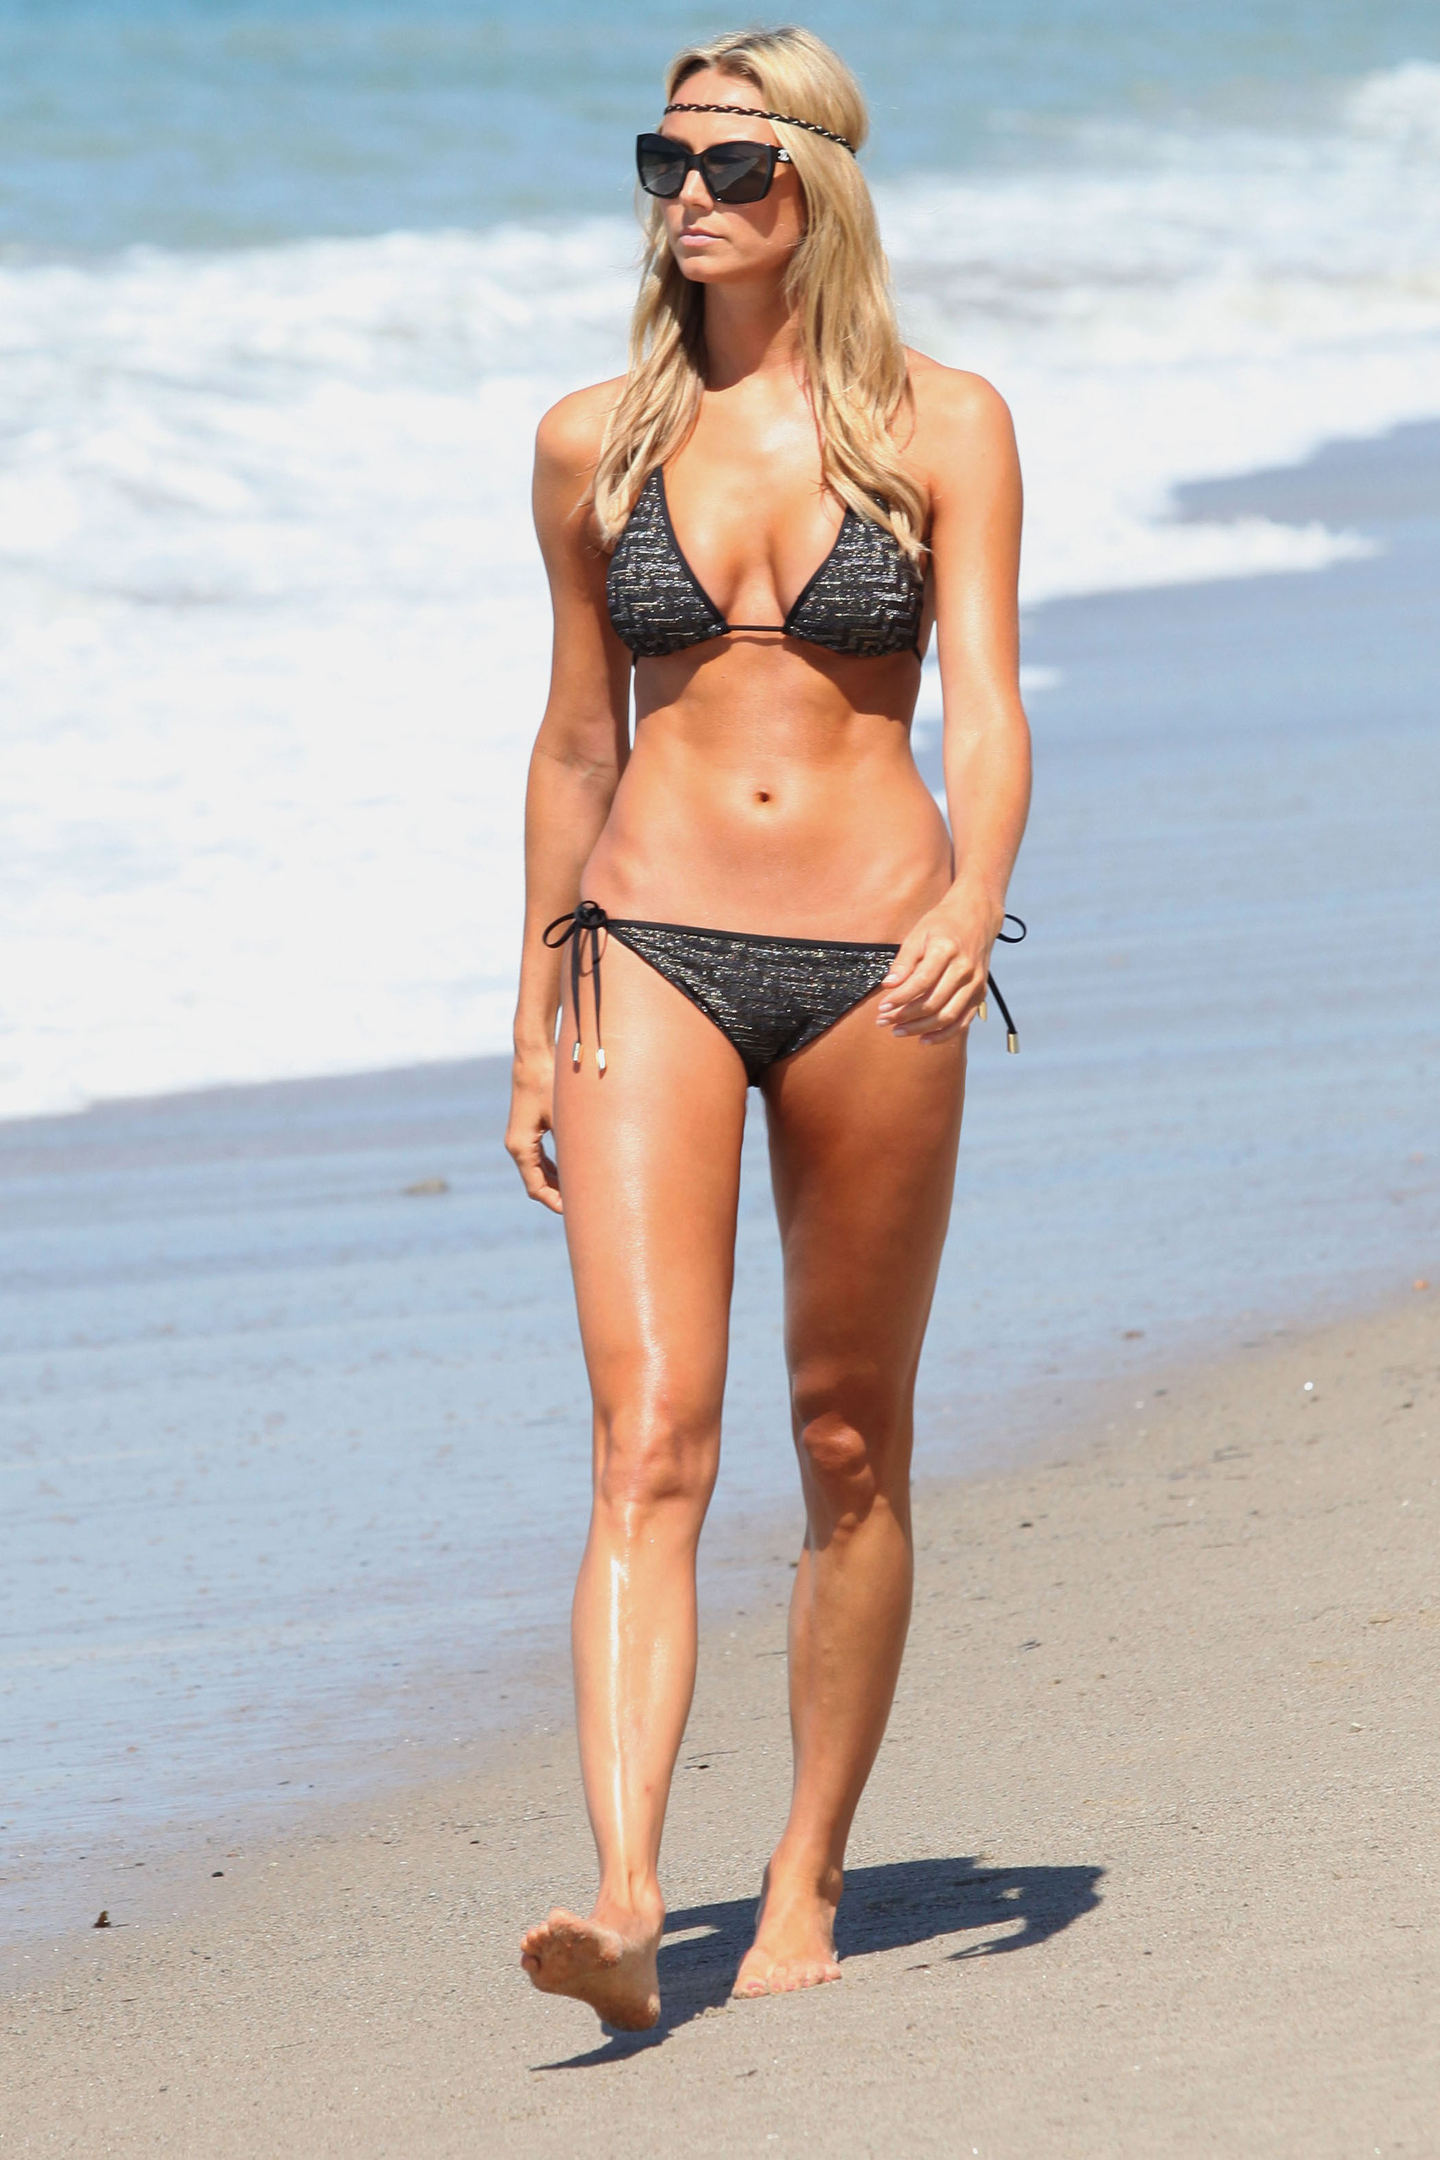 Stacy Keibler Bikini Pictures 26